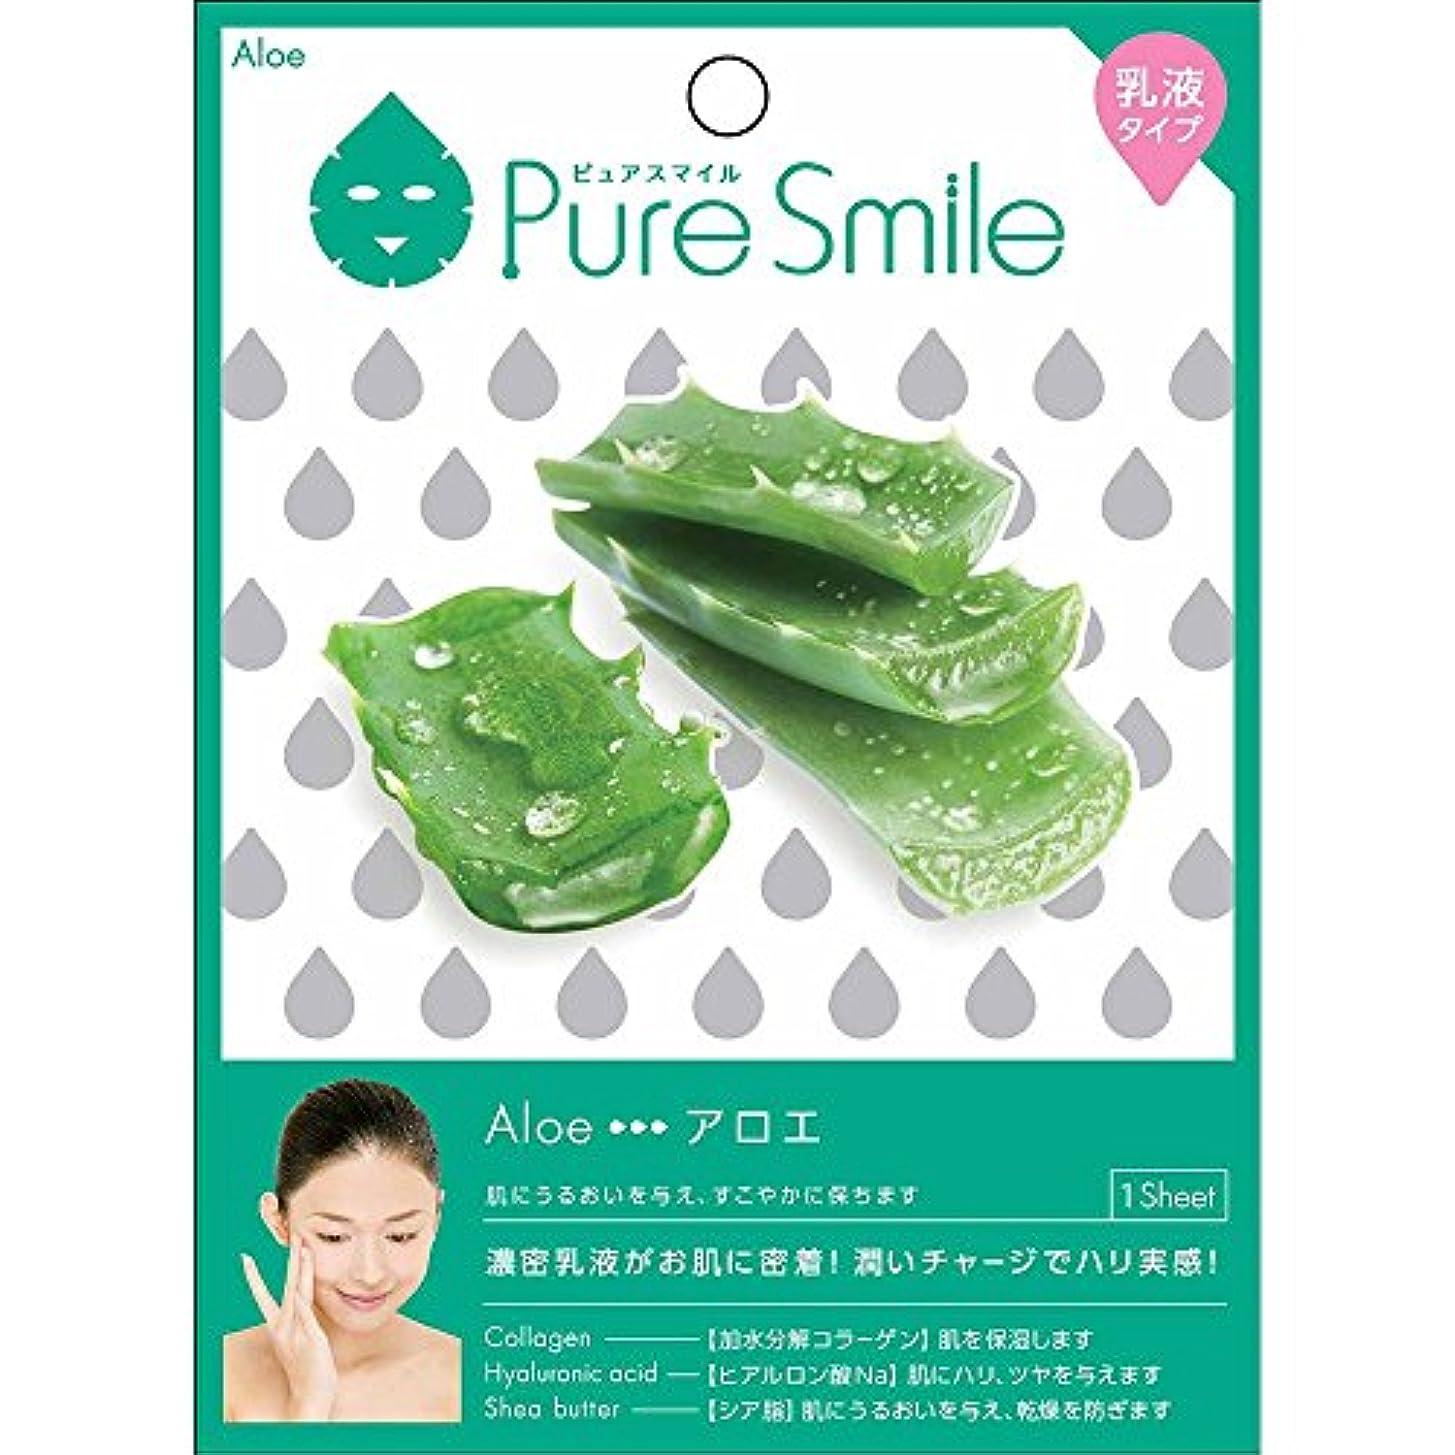 Pure Smile(ピュアスマイル) 乳液エッセンスマスク 1 枚 アロエ